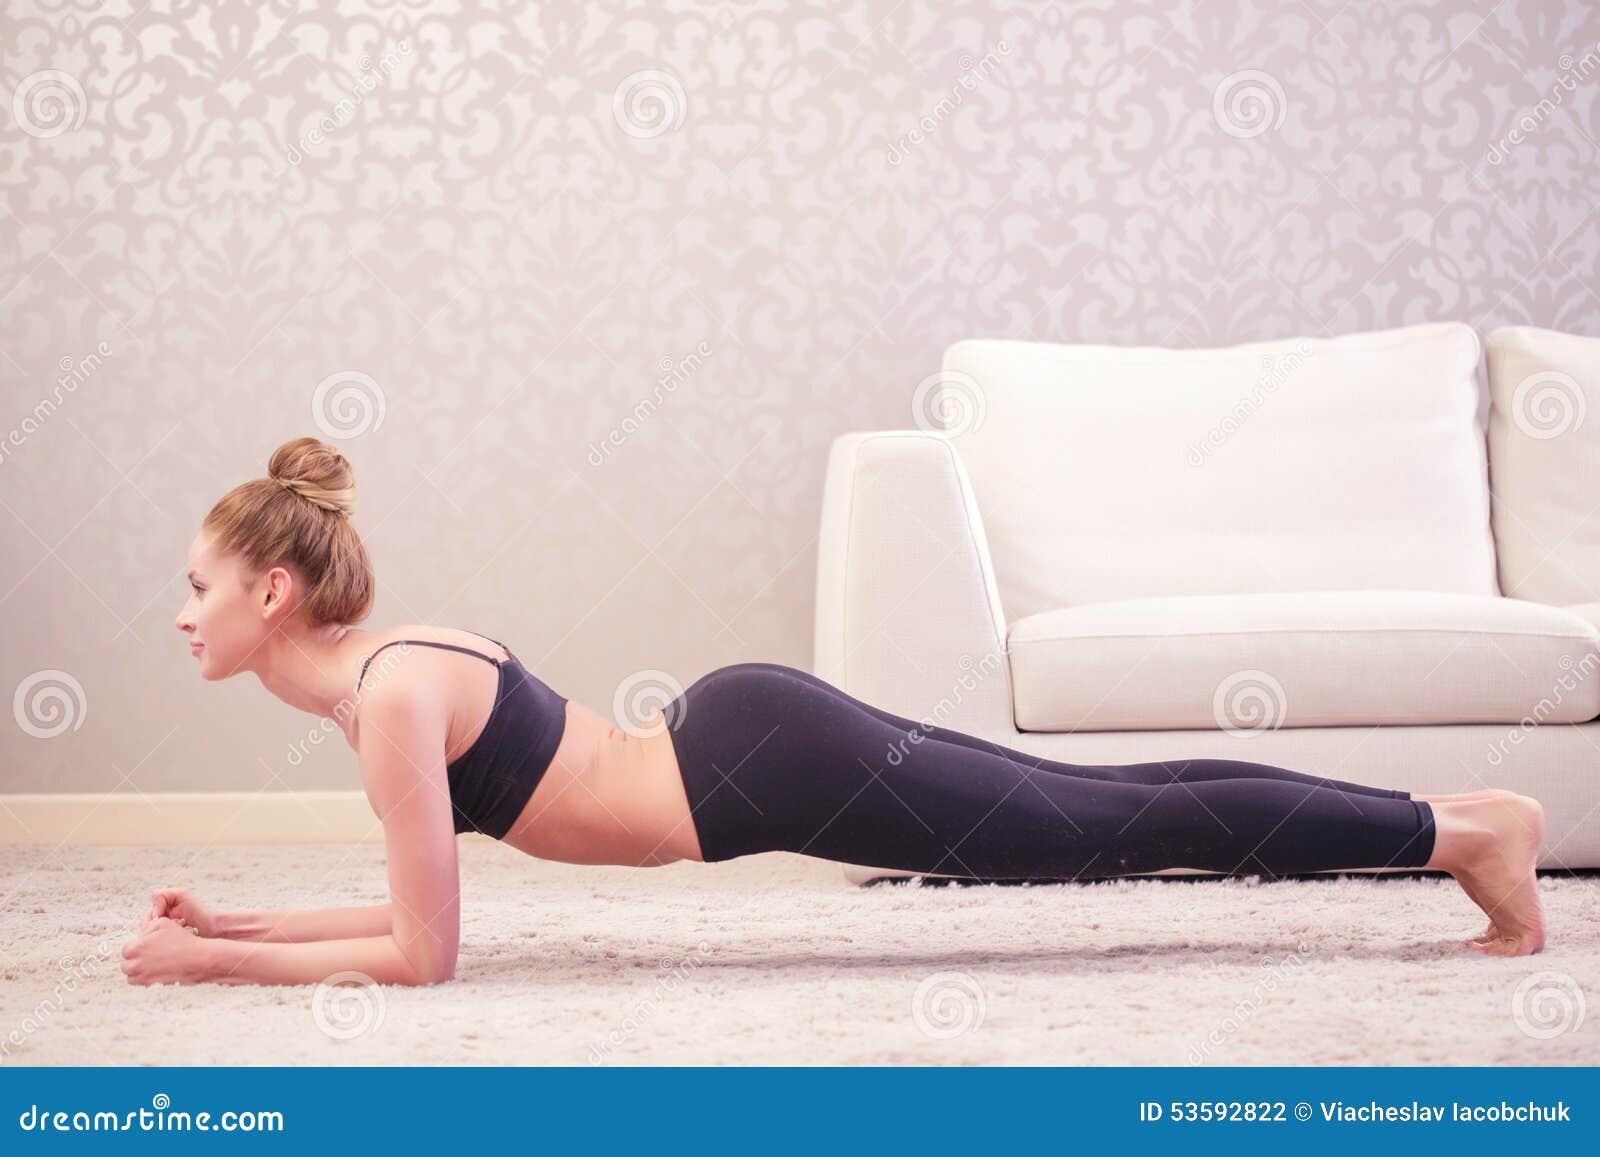 Lady doing plank exercise